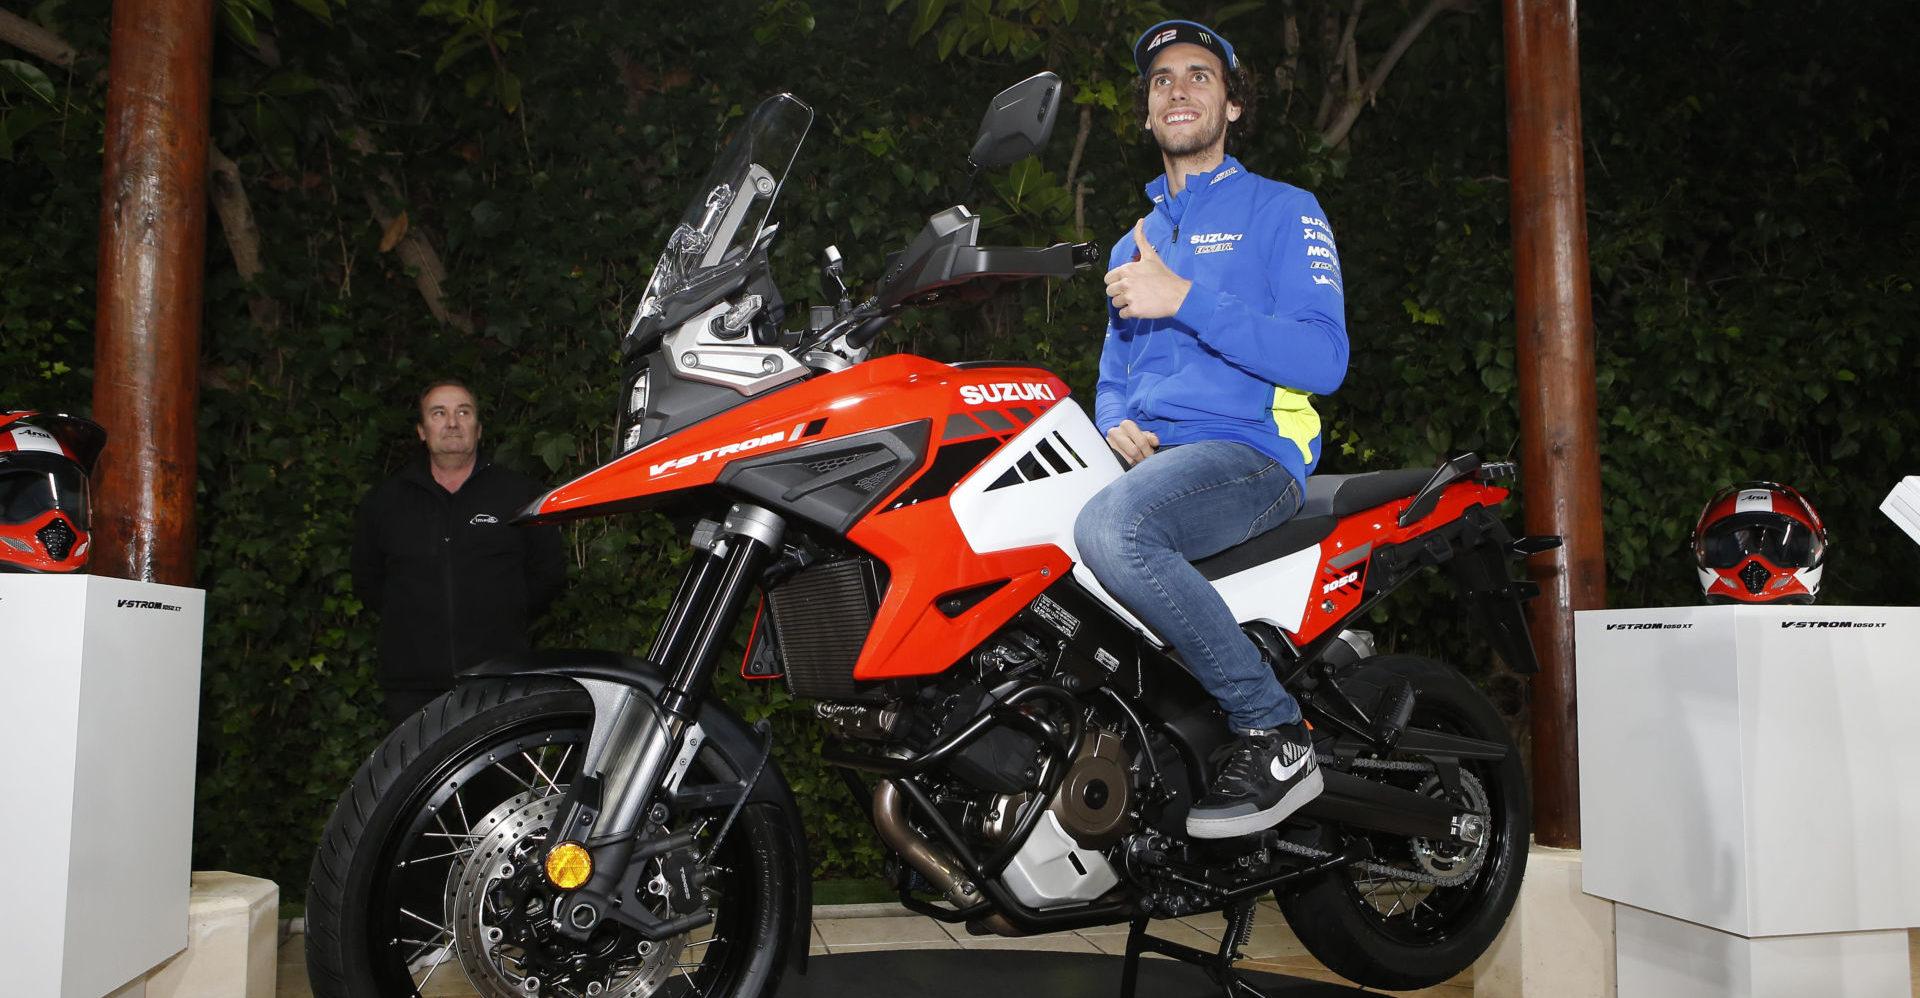 Alex Rins poses on a Suzuki V-STROM 1050. Photo courtesy of Team Suzuki Press Office.